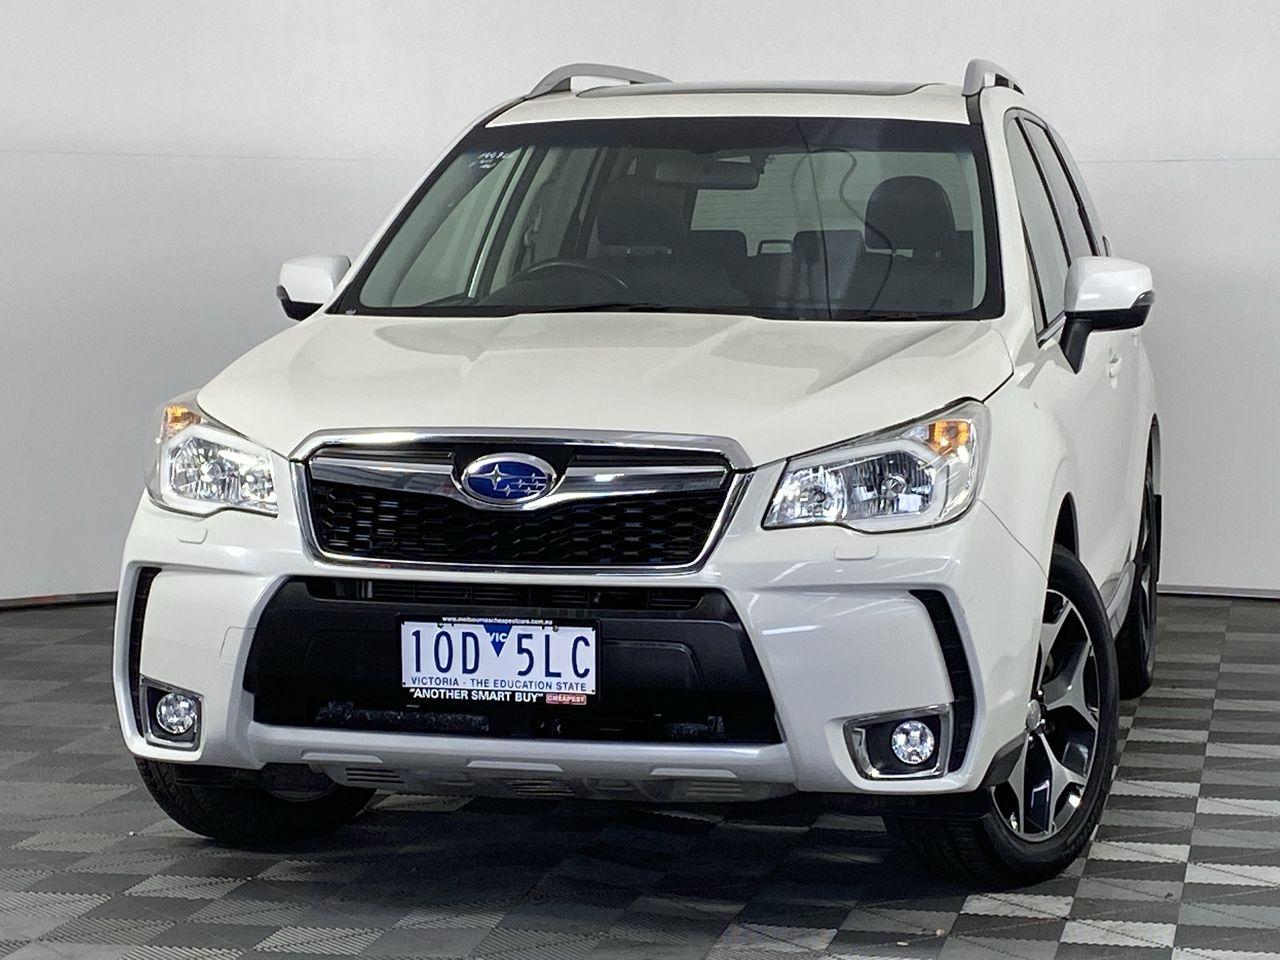 2015 Subaru Forester 2.0XT S4 CVT Wagon